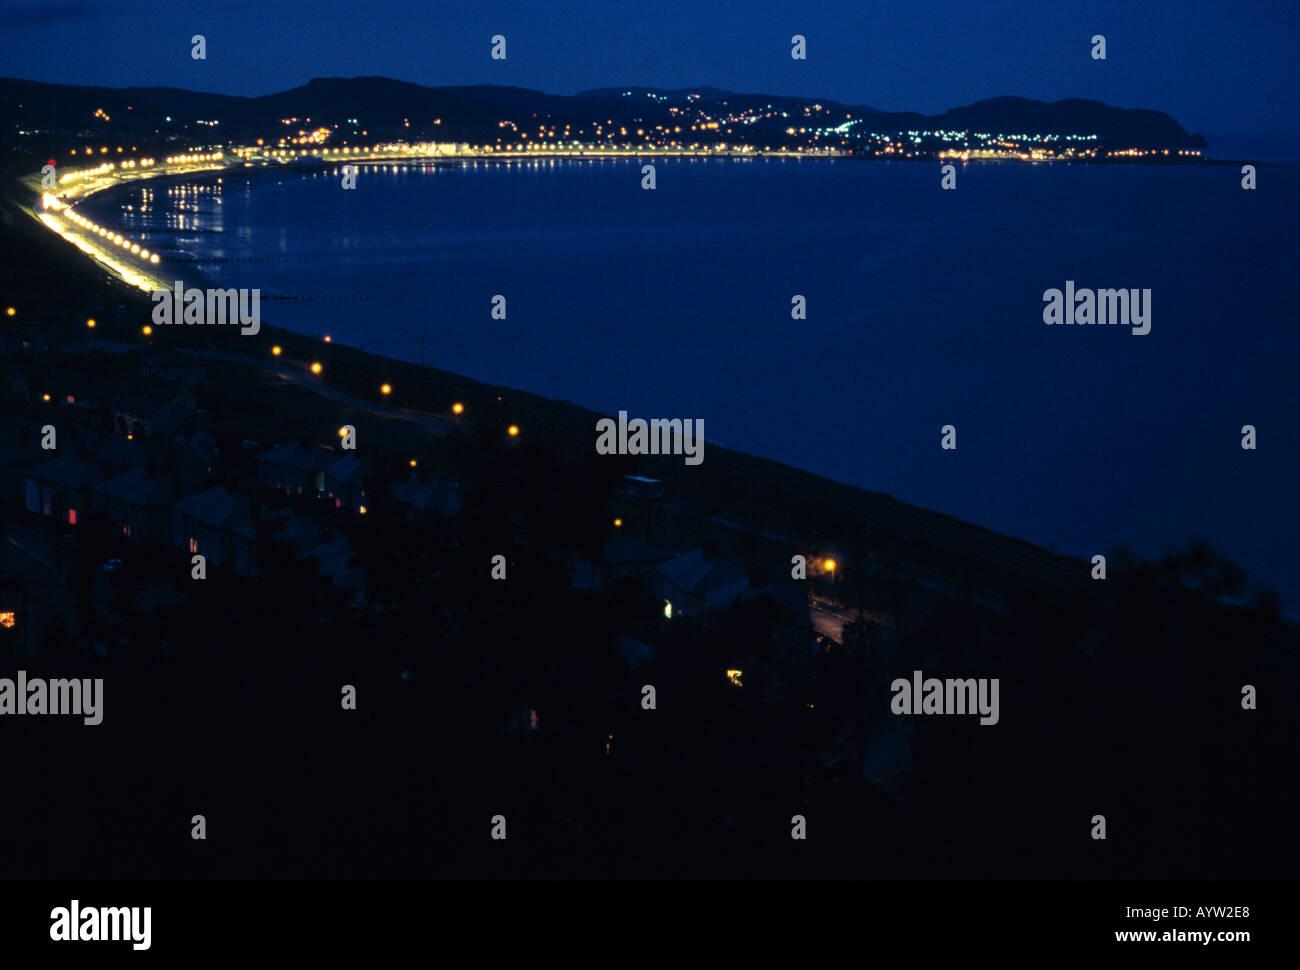 Night view of Colwyn bay illuminated with esplanade street lights - Stock Image